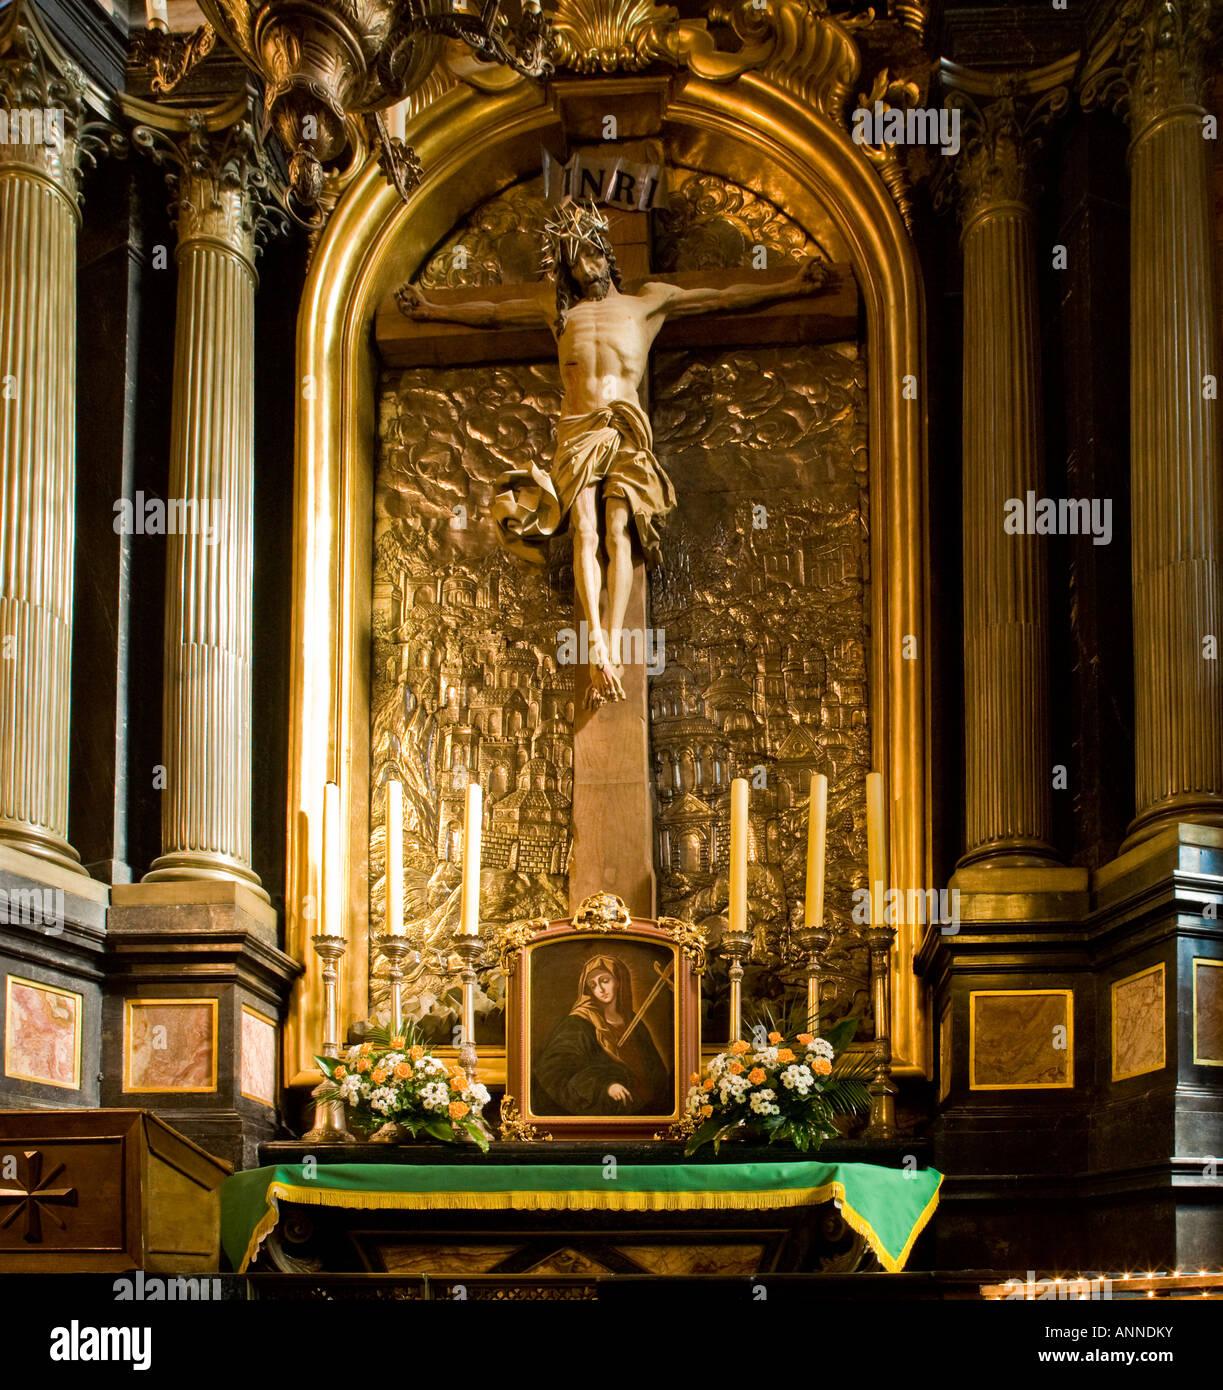 The Slacker Crucifix in the Church of St Mary, Krakow, Poland, EU. - Stock Image